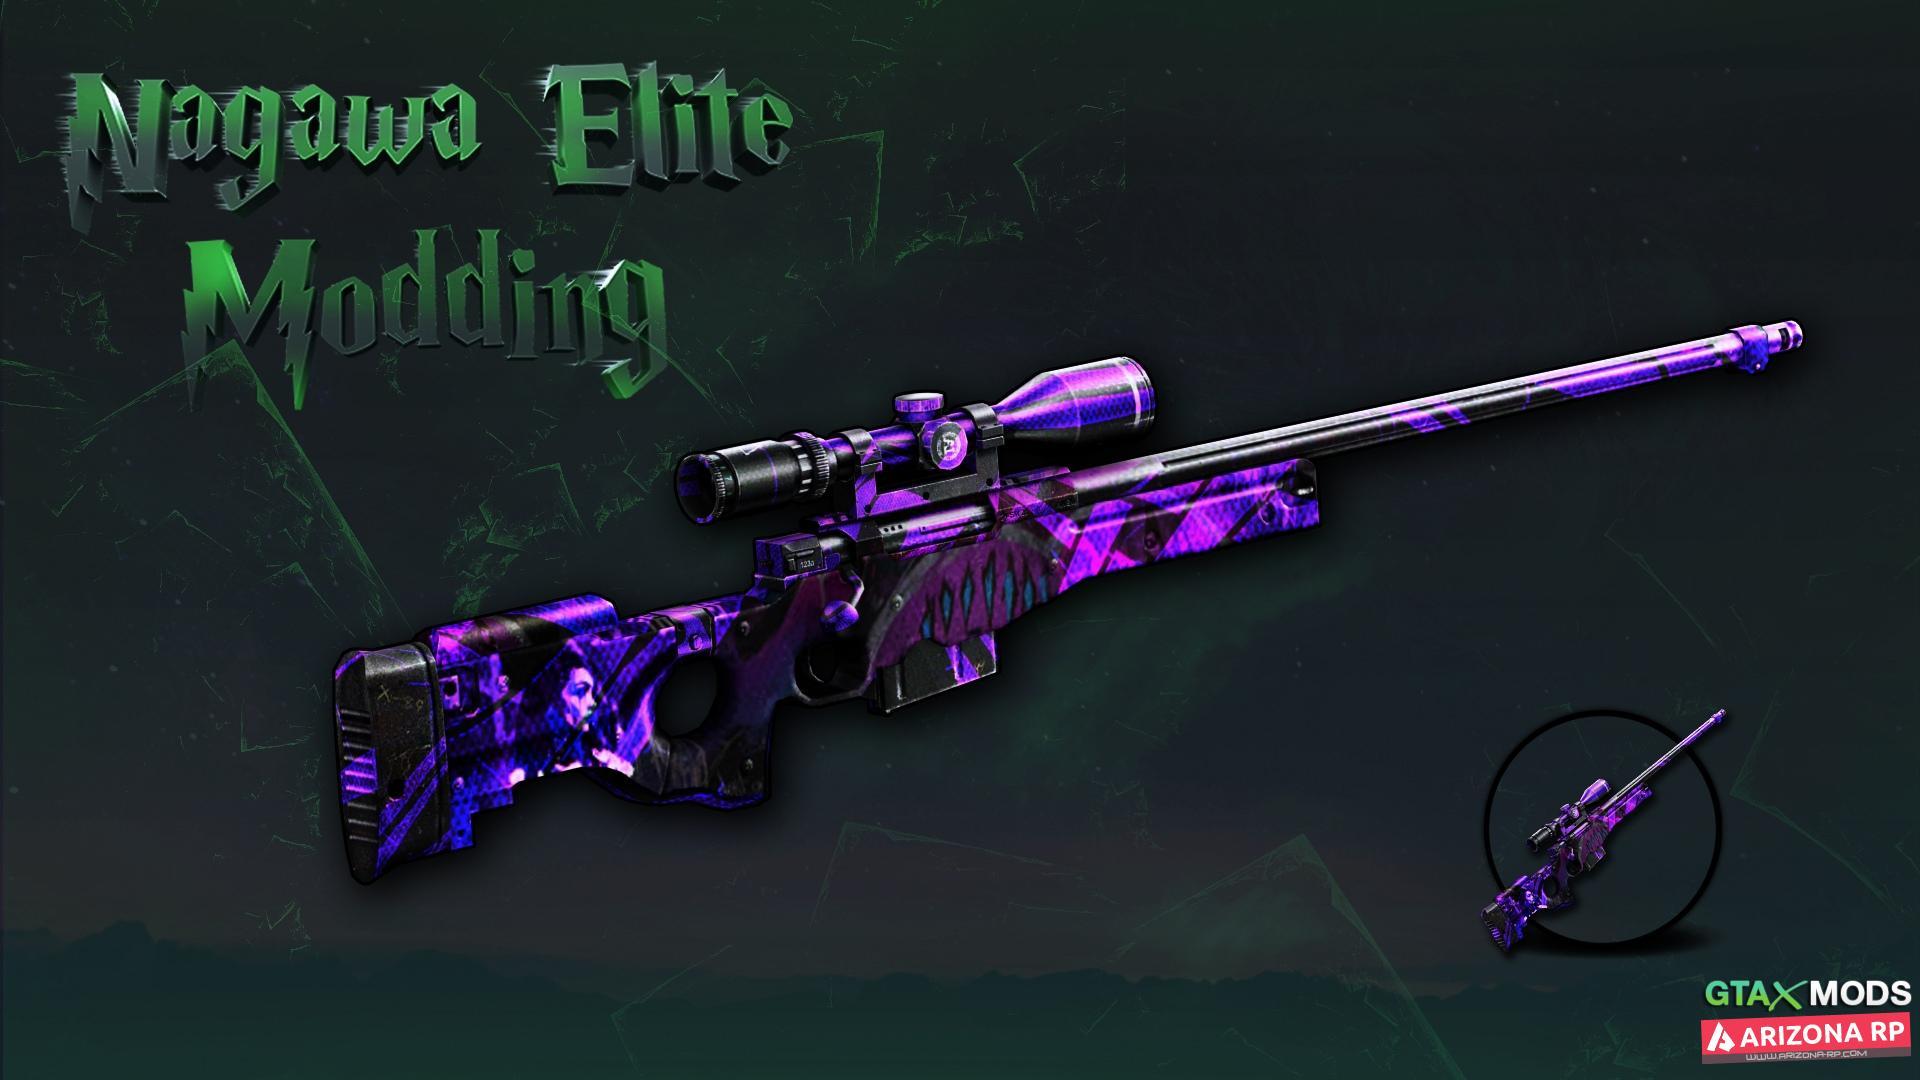 Sniper | Riot Pack | Nagawa Elite Modding